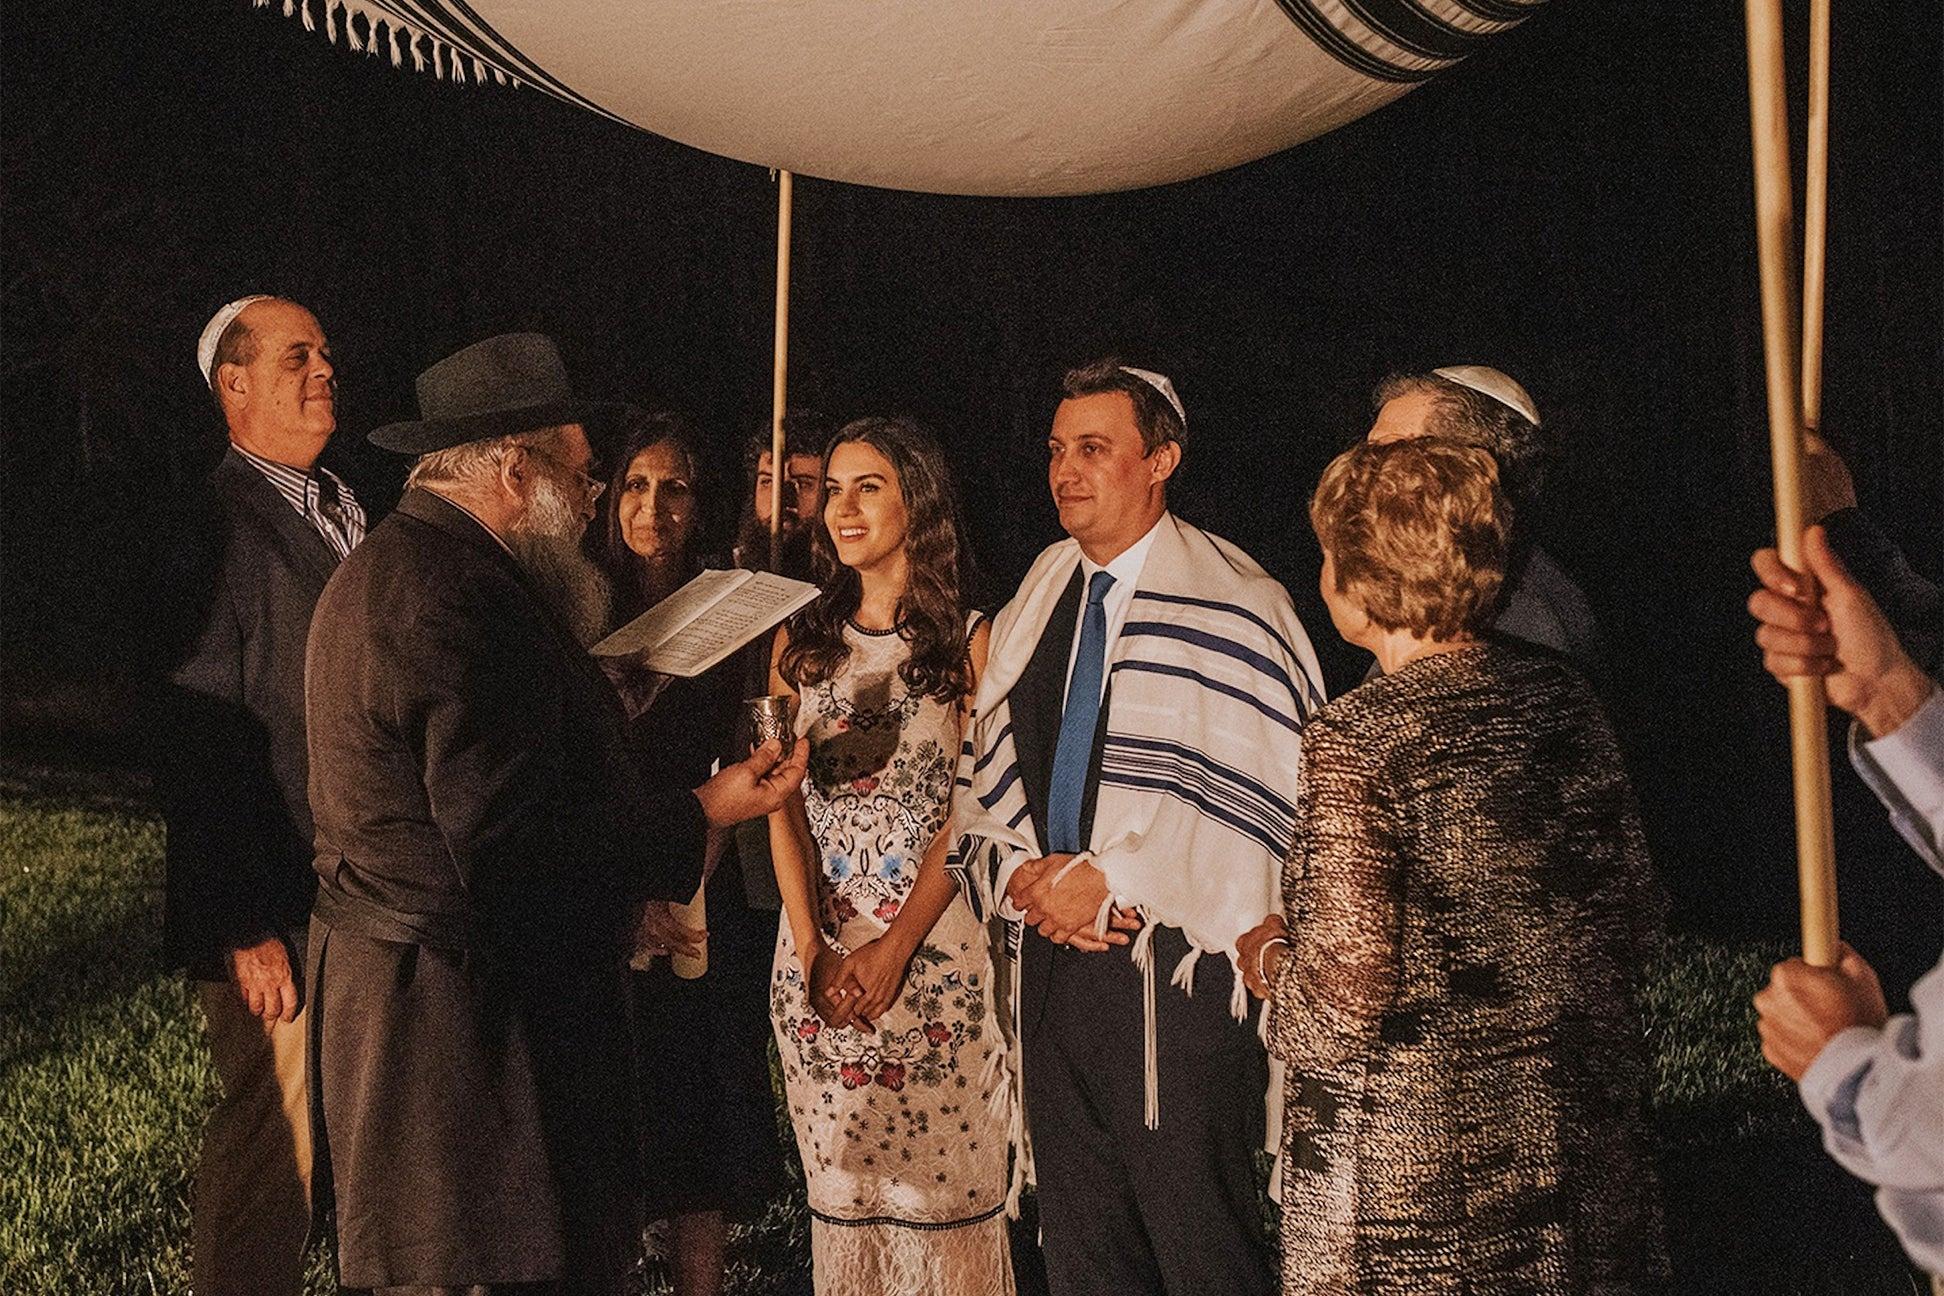 Jewish ceremony under a huppah